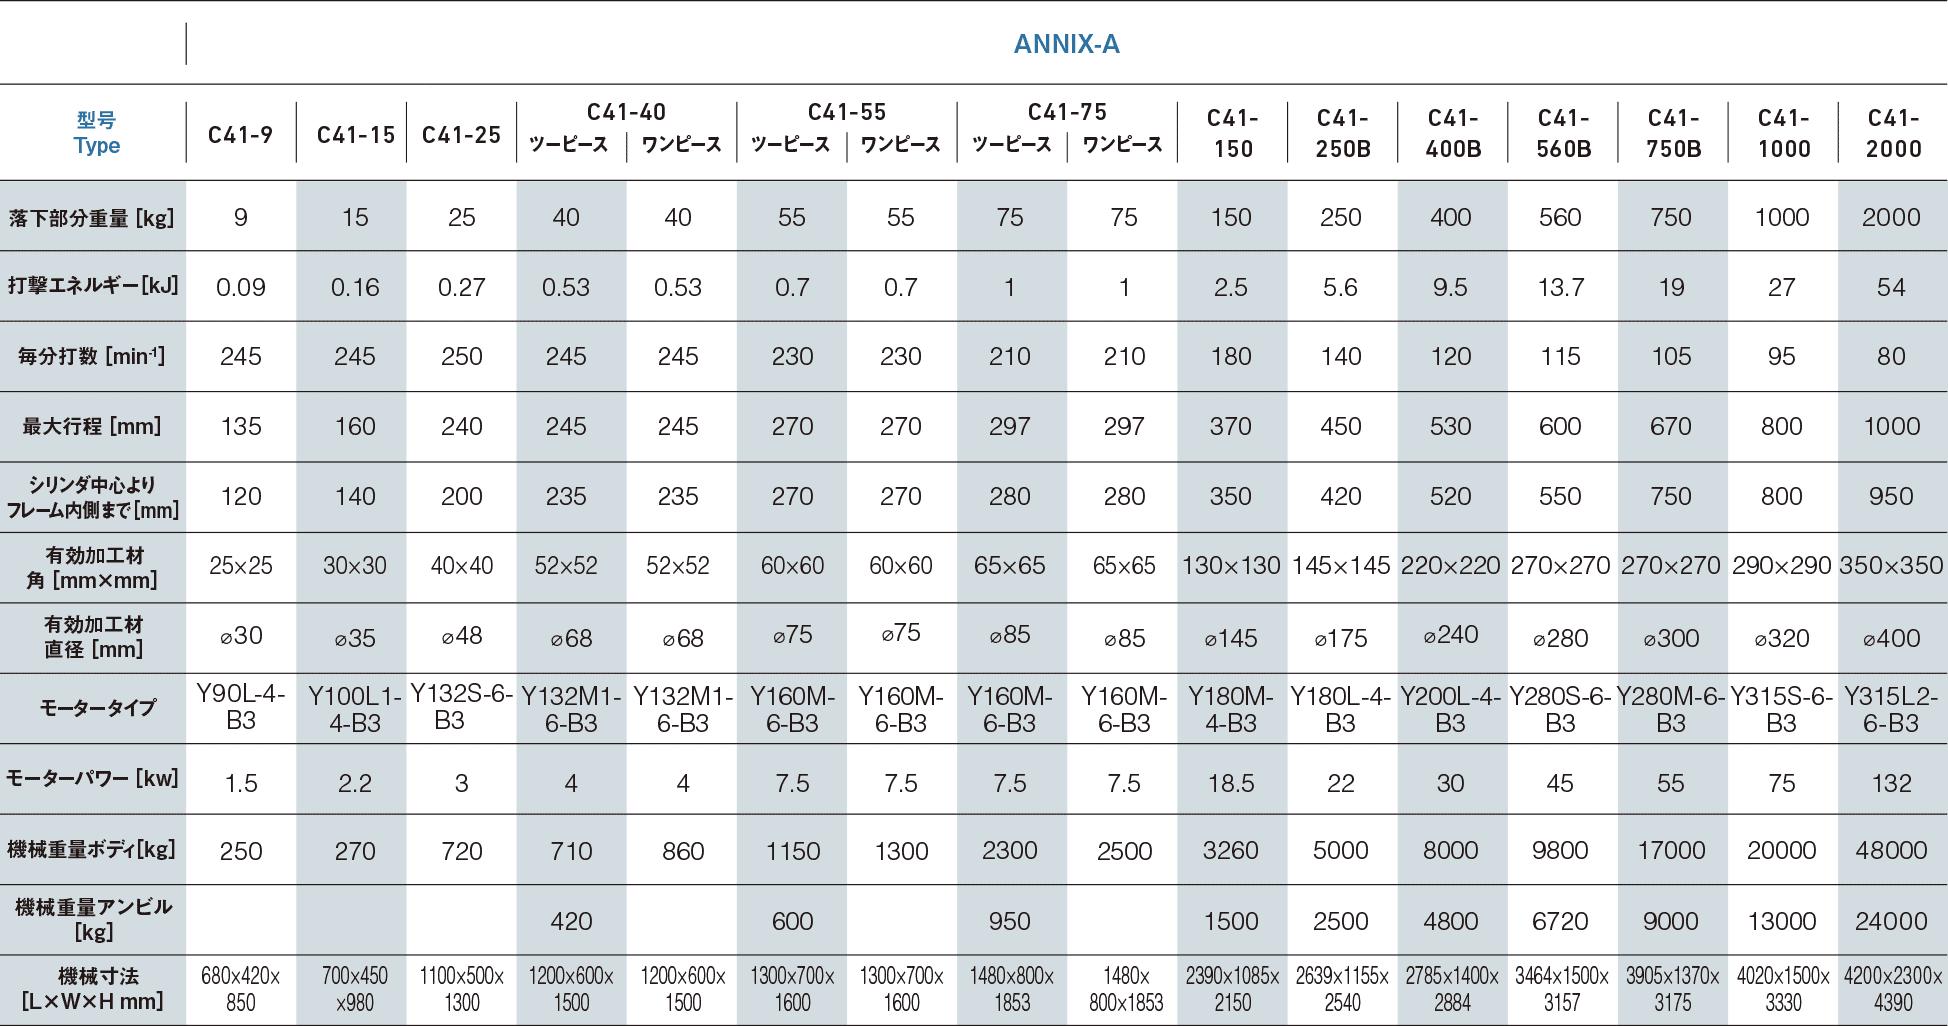 ANNIX-A 詳細「アニックスエアーハンマー」